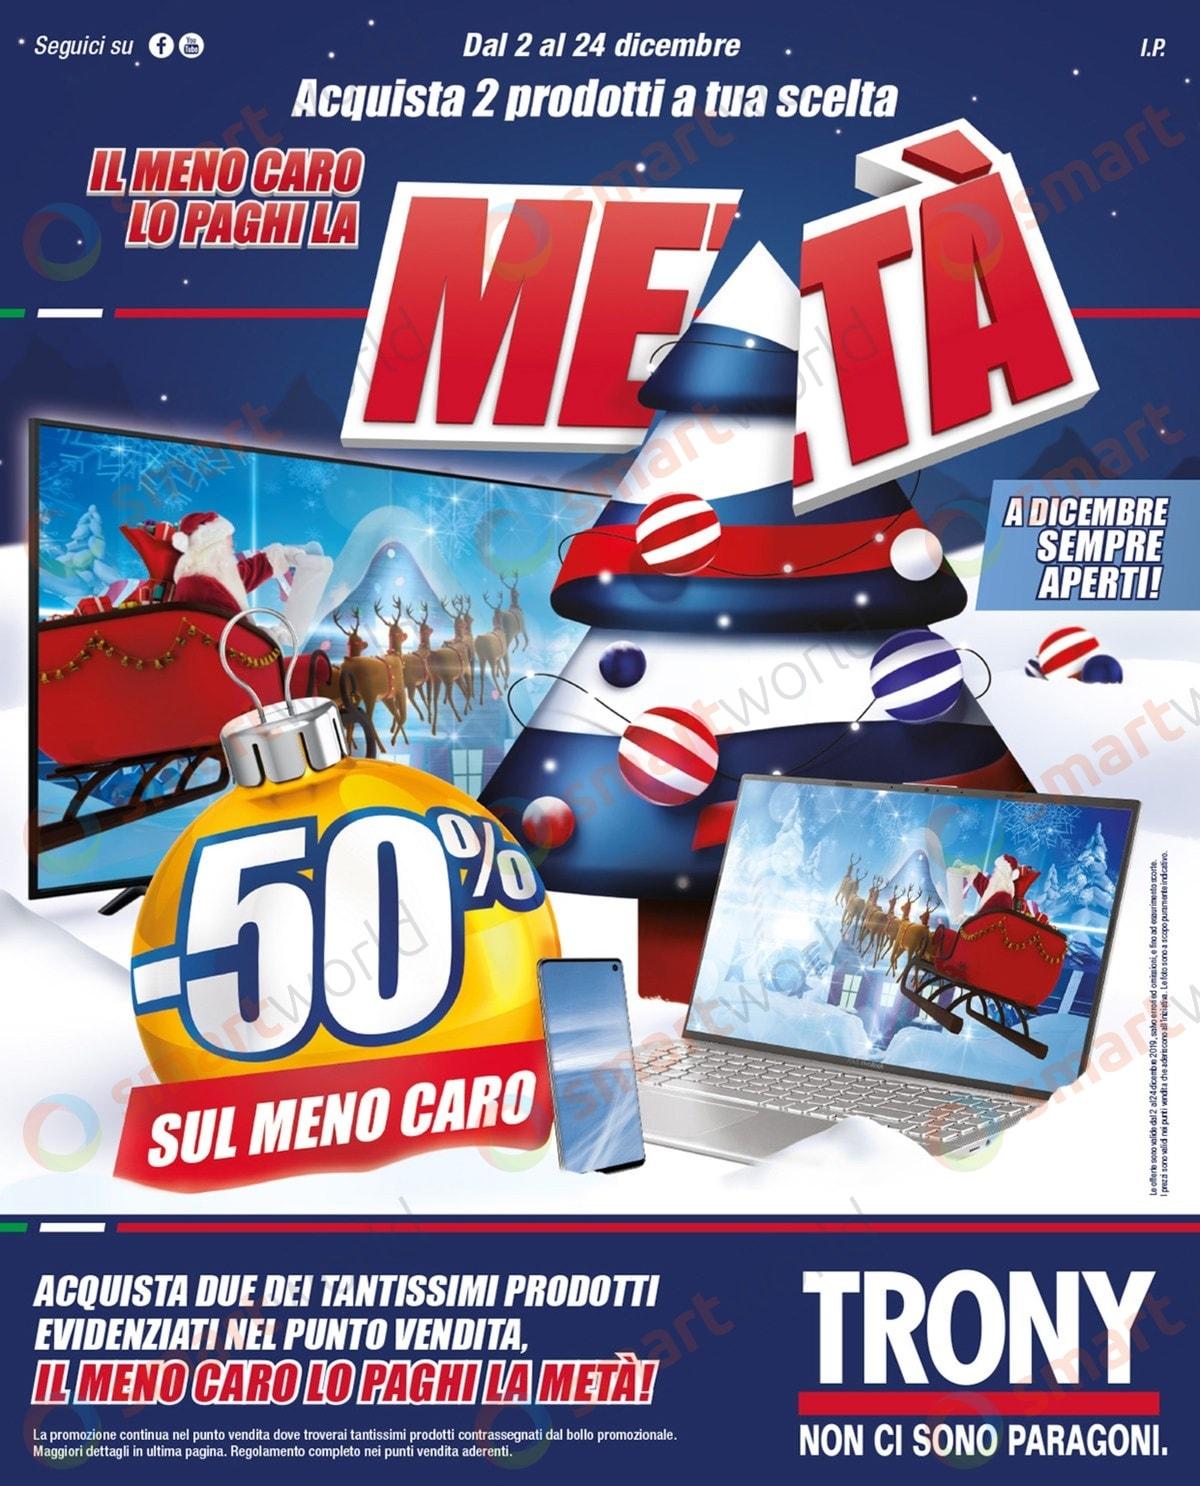 volantino trony 02-24 dicembre 2019 -1